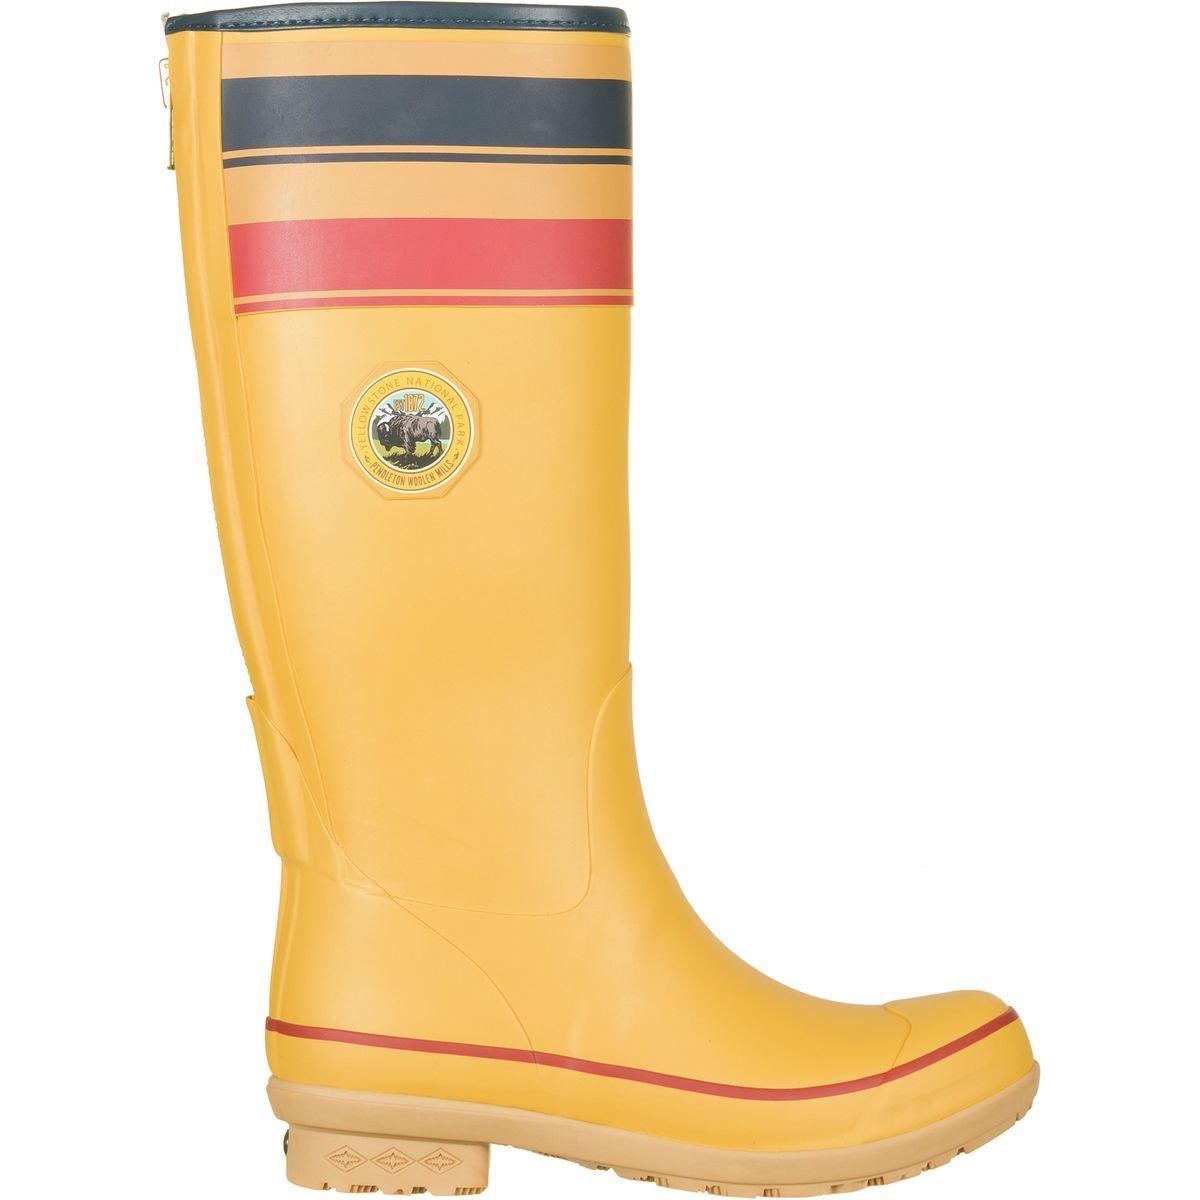 Pendleton NATIONAL PARK TALL RAIN BOOTS B0776ZM98S 7 B(M) US|Yellowstone Yellow